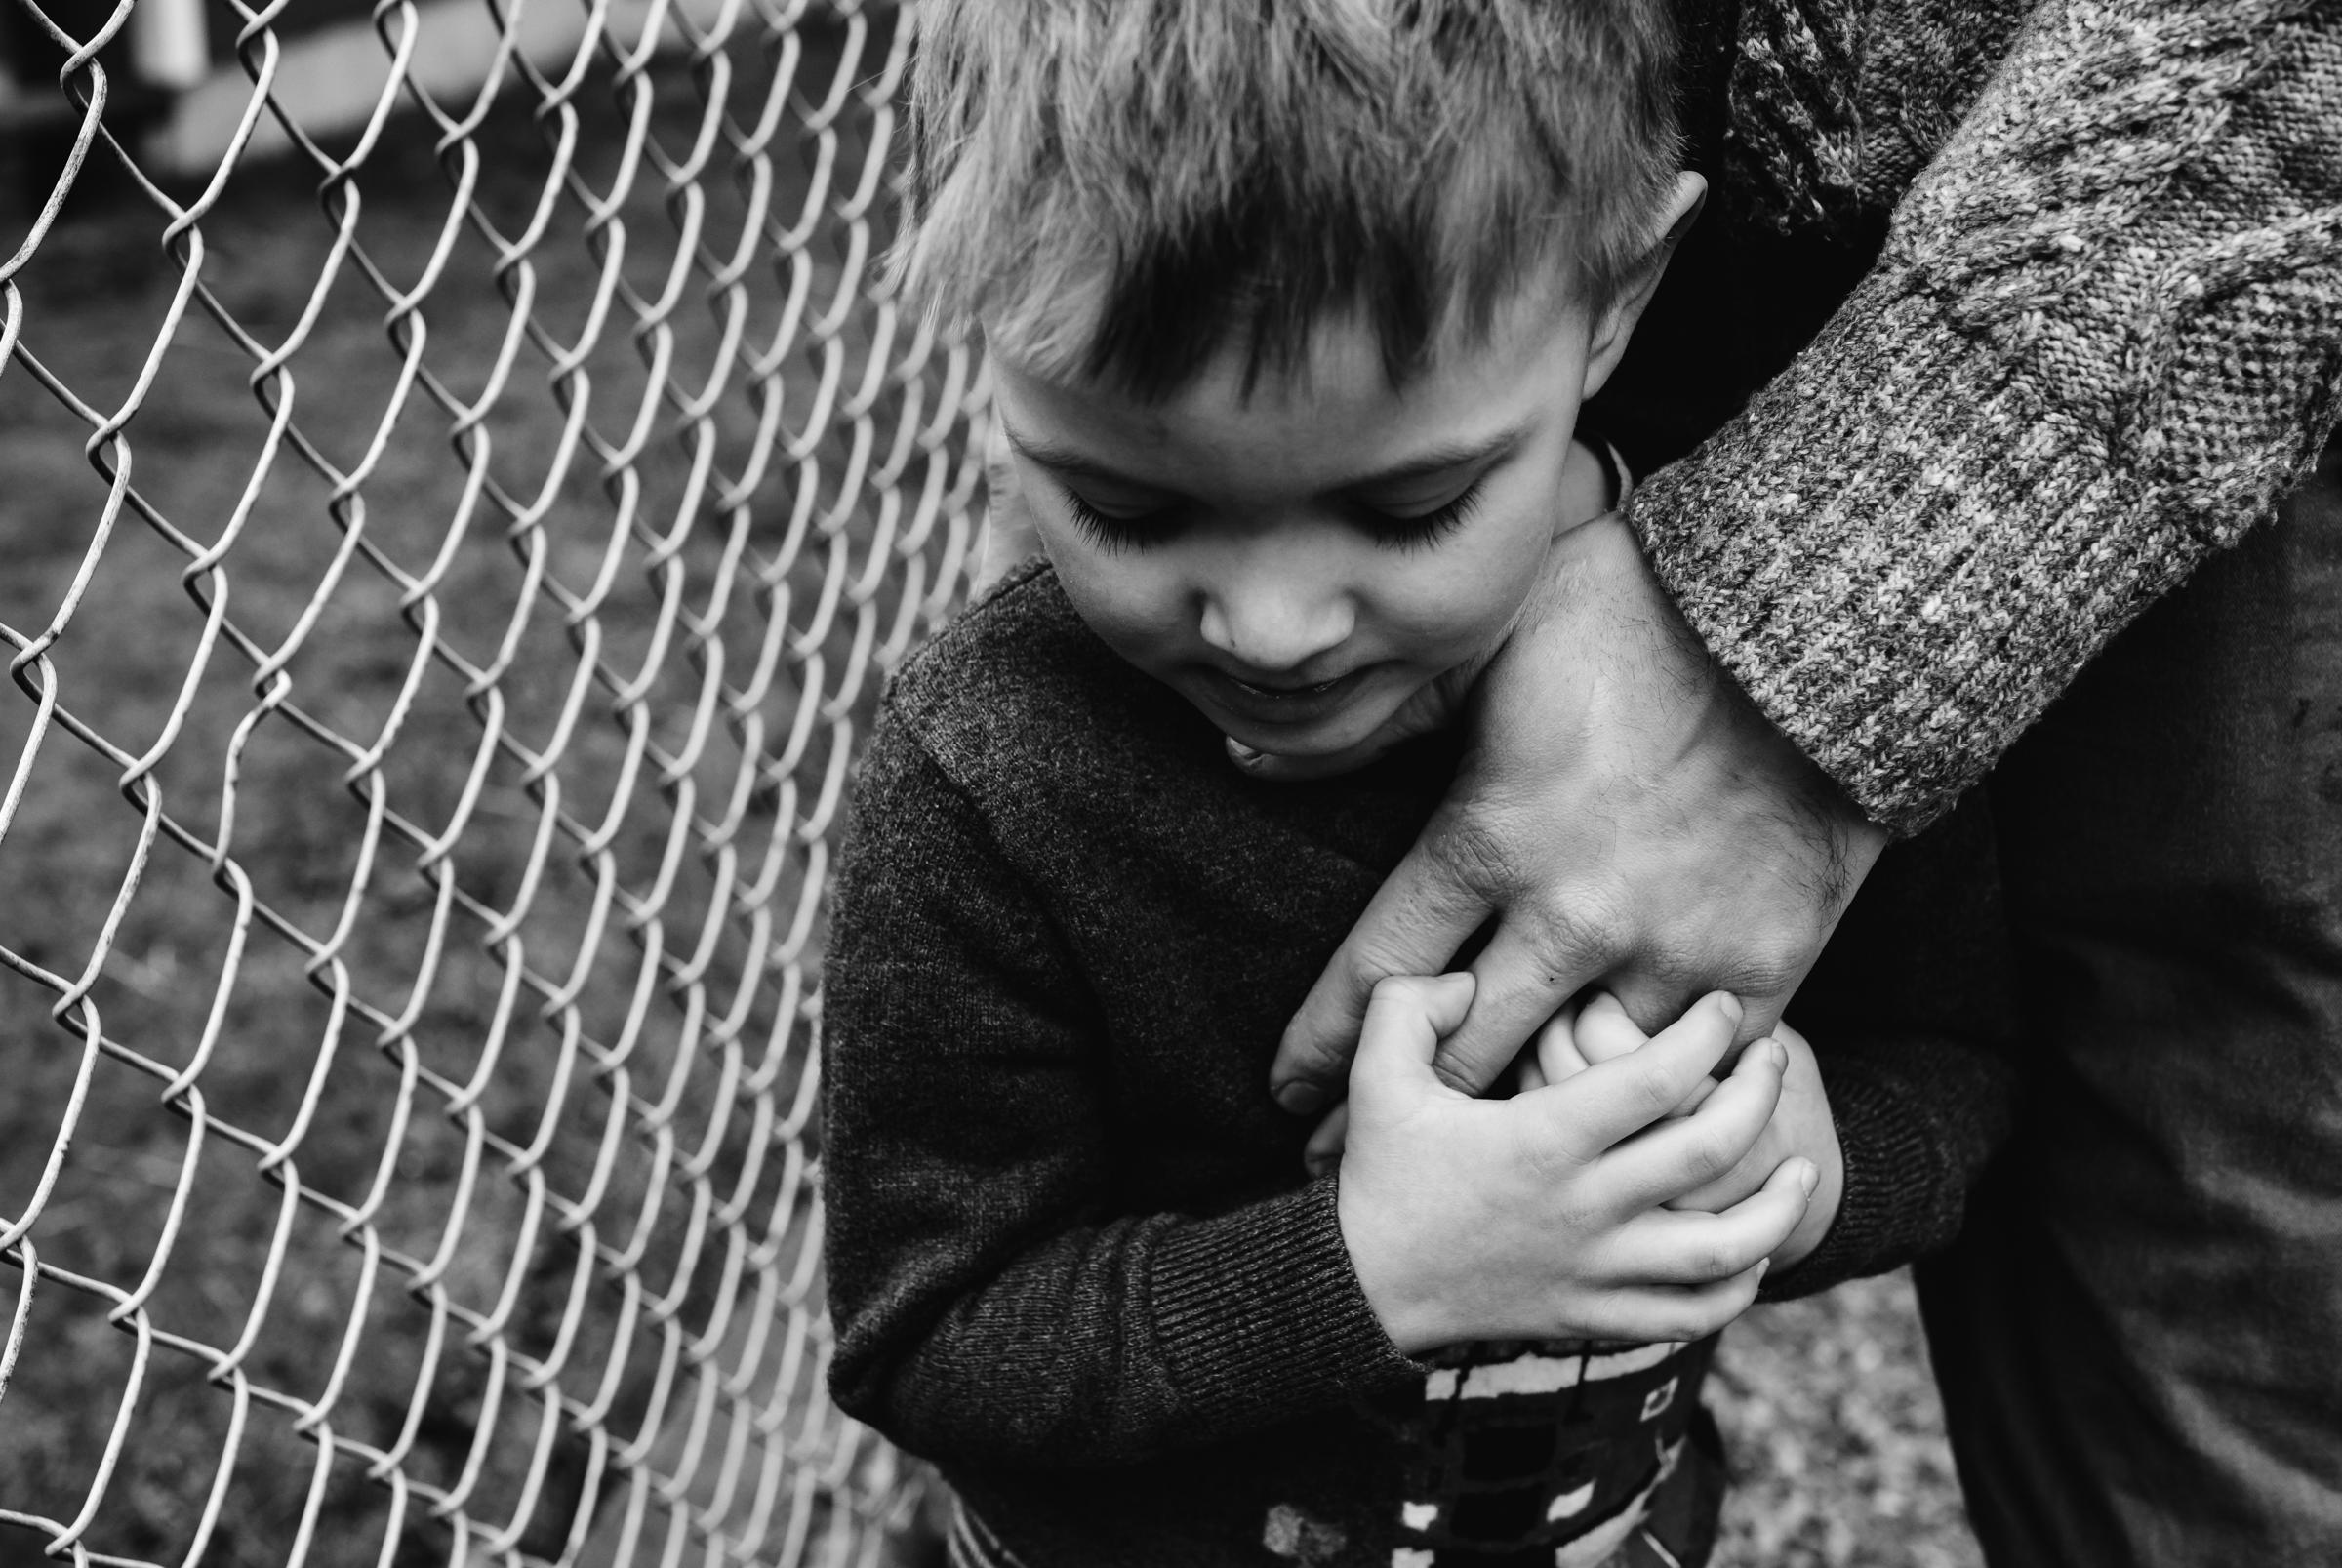 Nicola-Reiersen-Photography-Victoria-BC-Family-Photographer (8).jpg